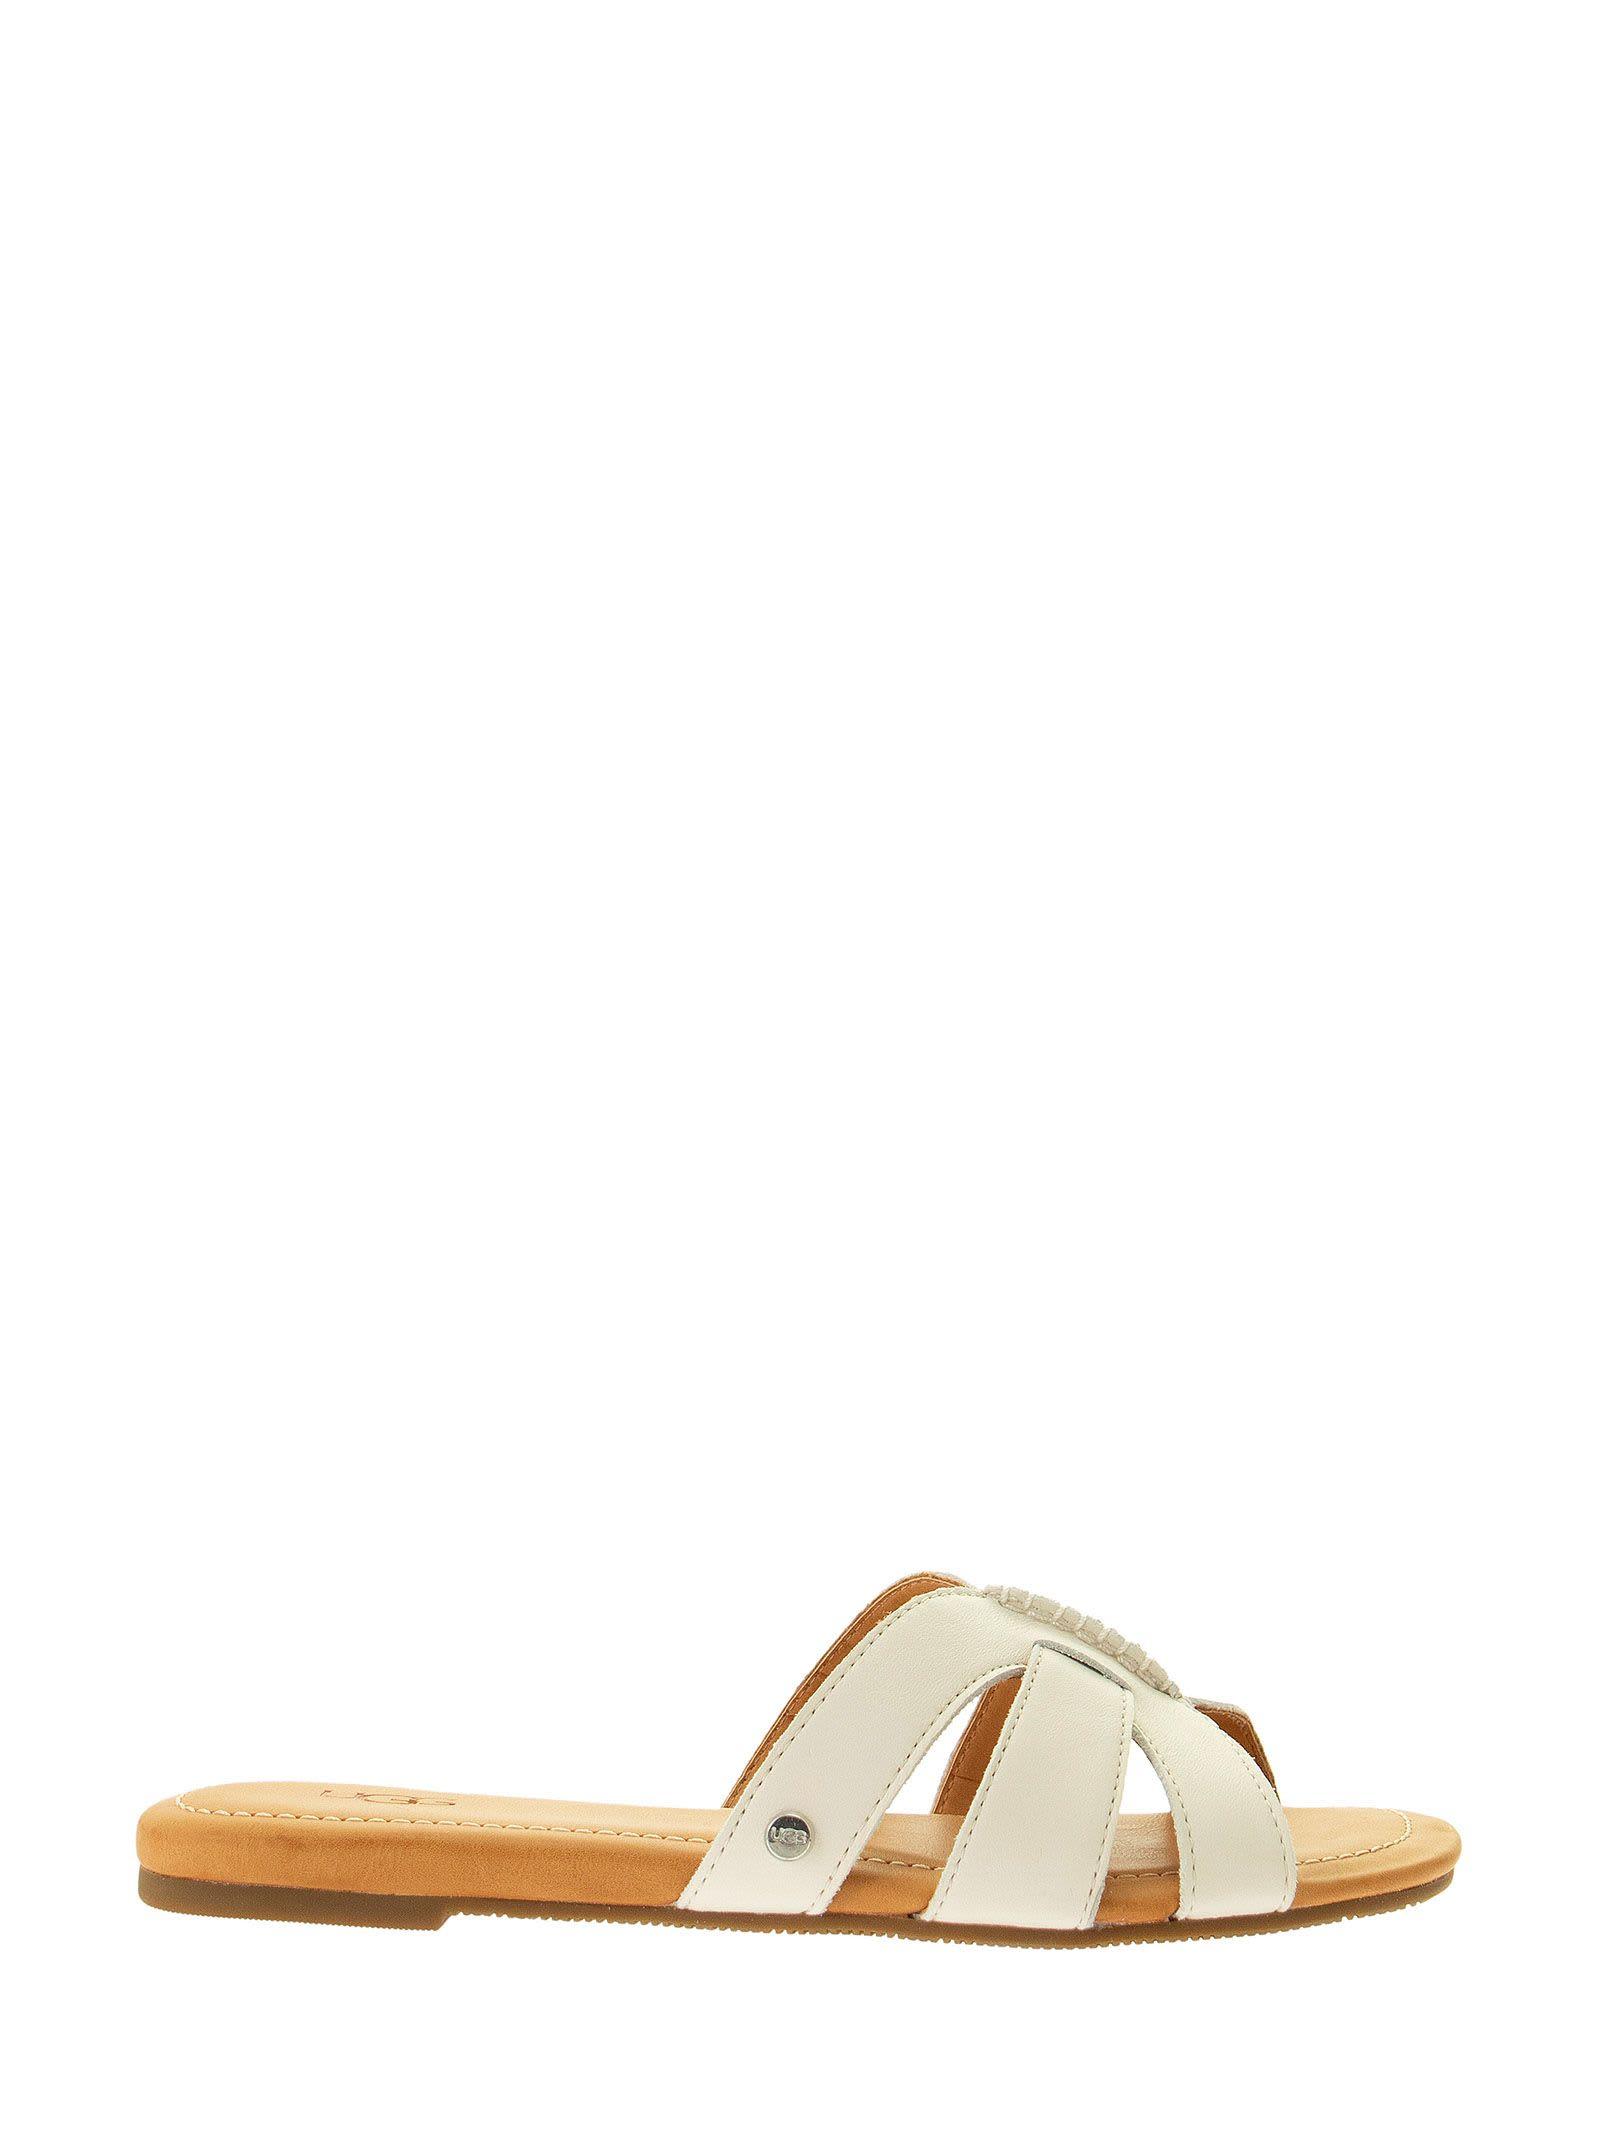 UGG Teague Jasmine - Leather Sandal